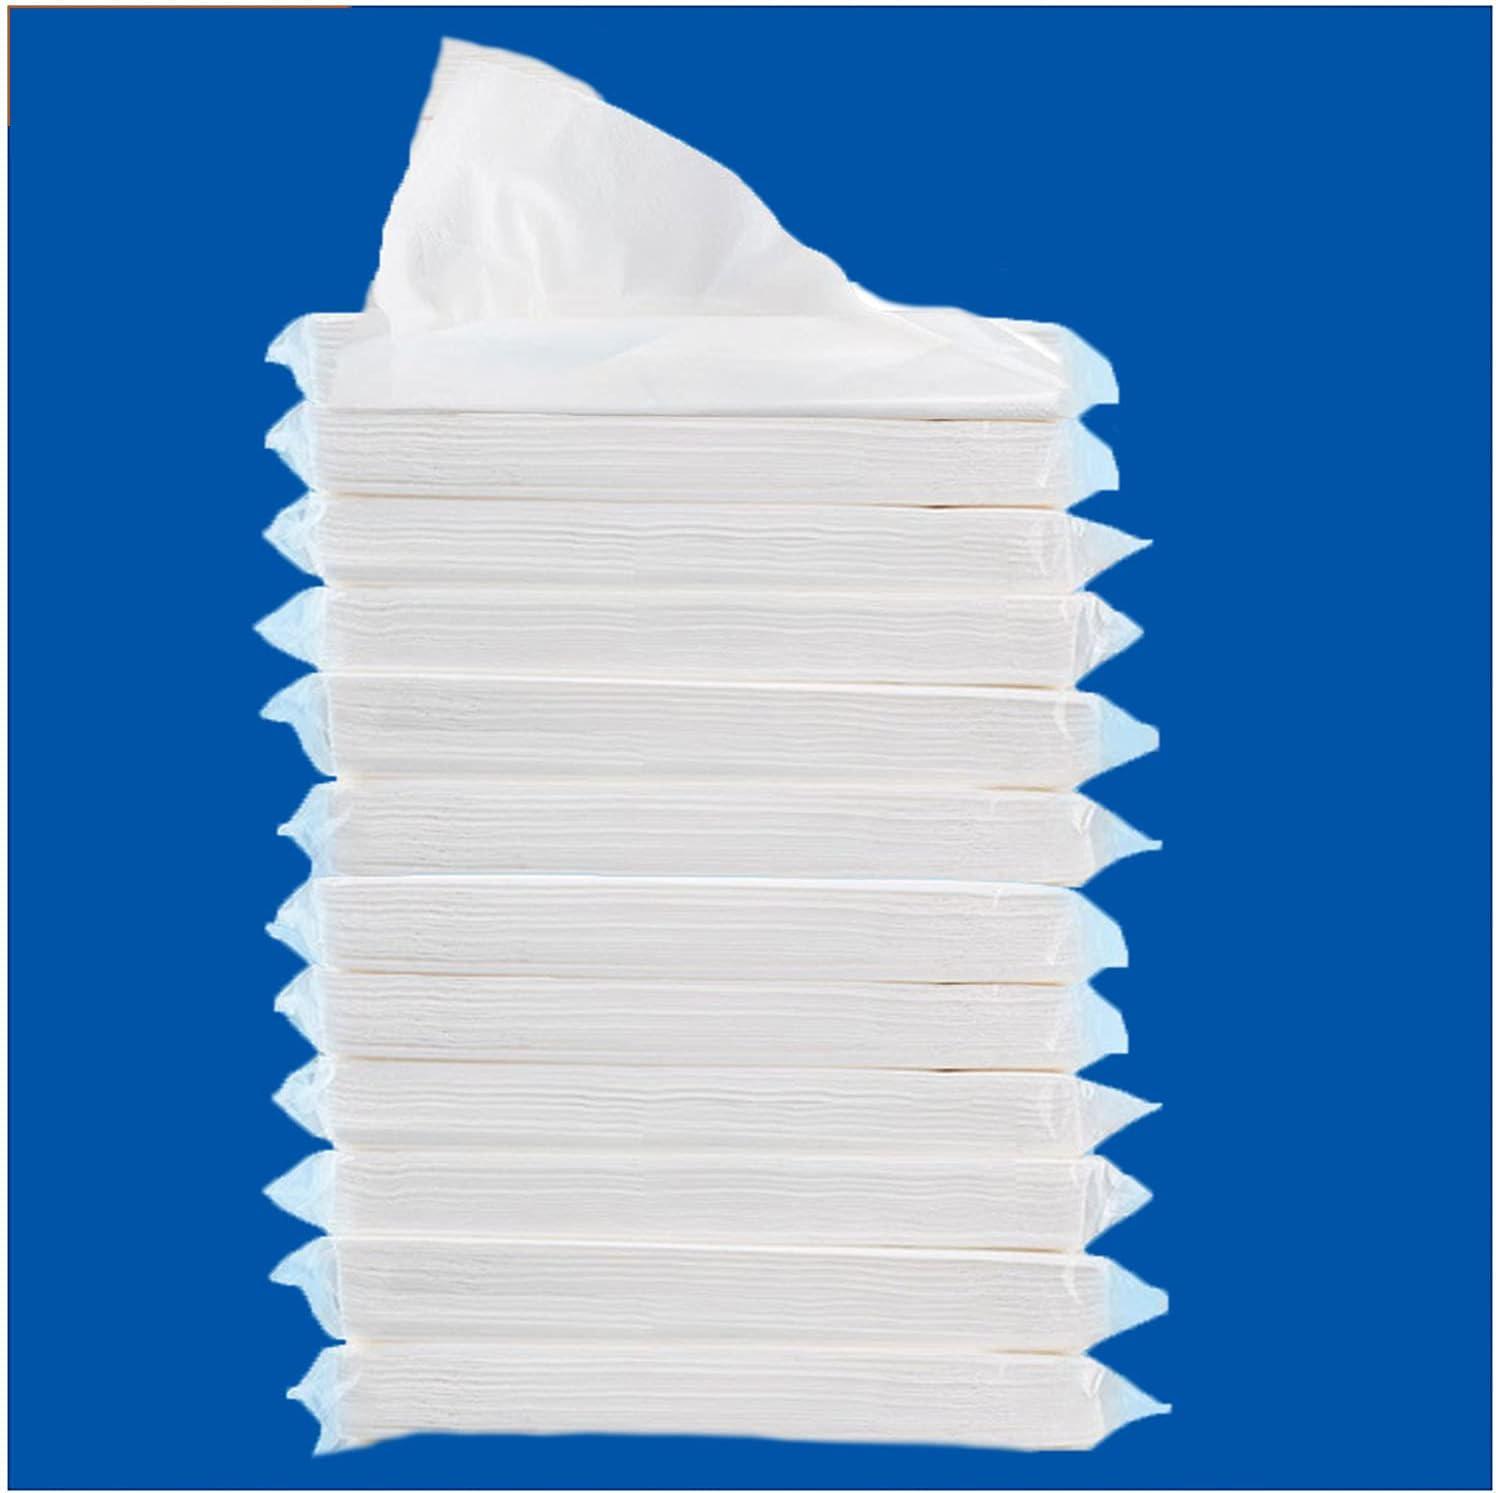 Car Tissue Auto Visor Case Refills 4 years warranty Napki for 35% OFF